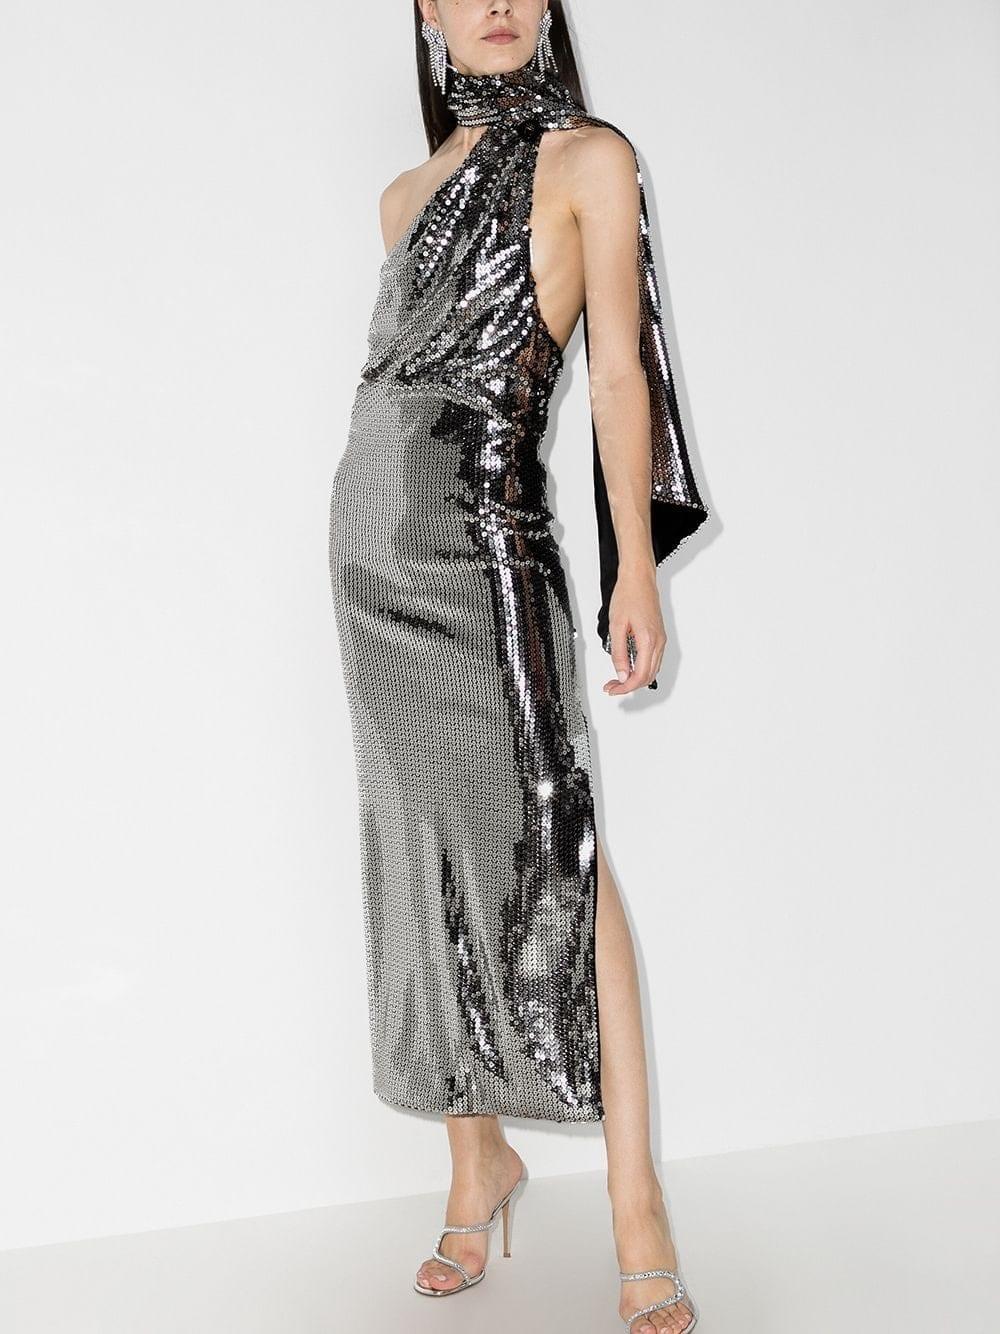 THE ATTICO Sequinned Halterneck Dress